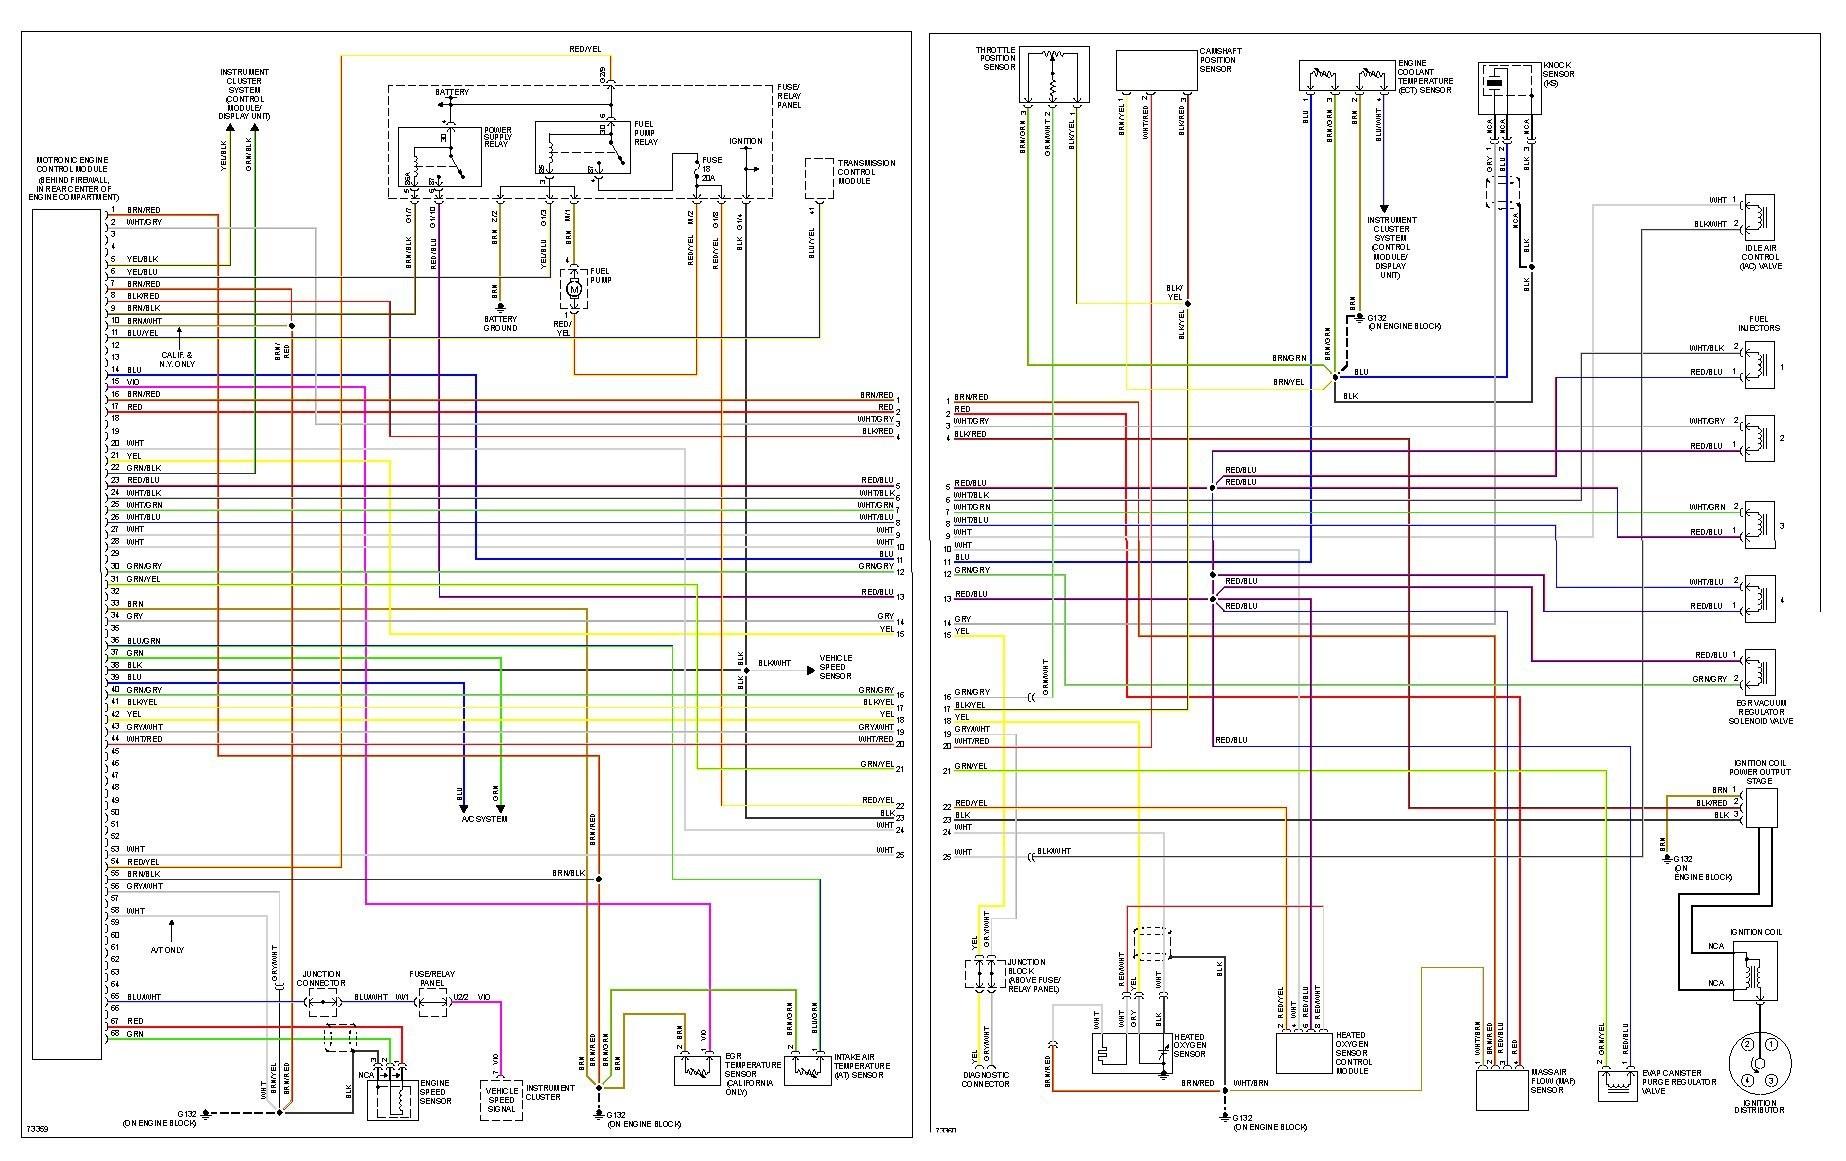 2003 Vw Jetta Engine Diagram Vw Golf Wiring Diagram Wiring Diagram Of 2003 Vw Jetta Engine Diagram